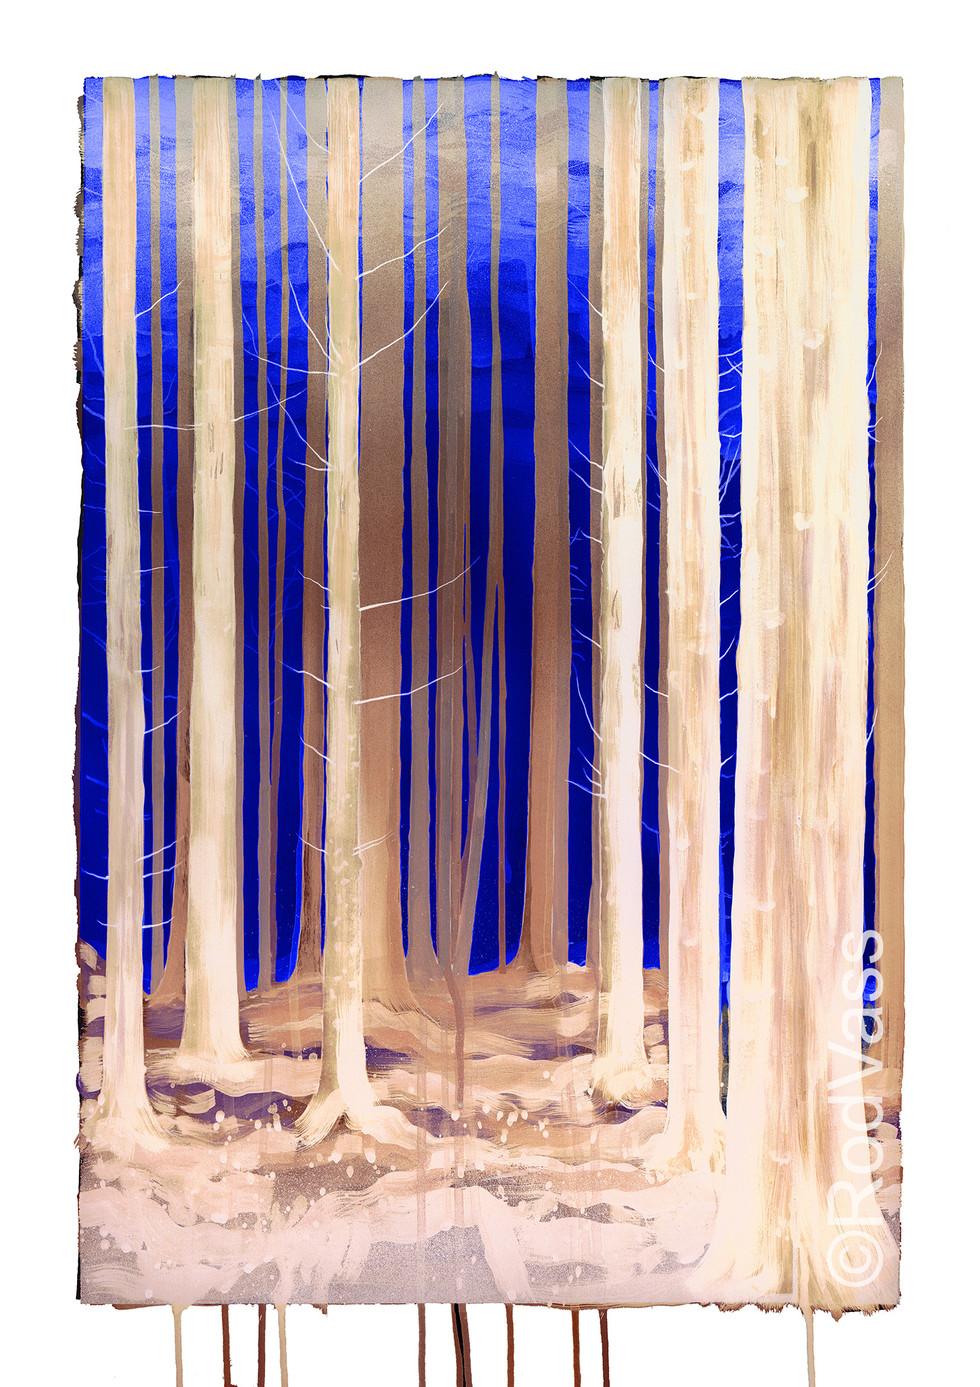 Sapphire Sky - left panel - By Rod Vass